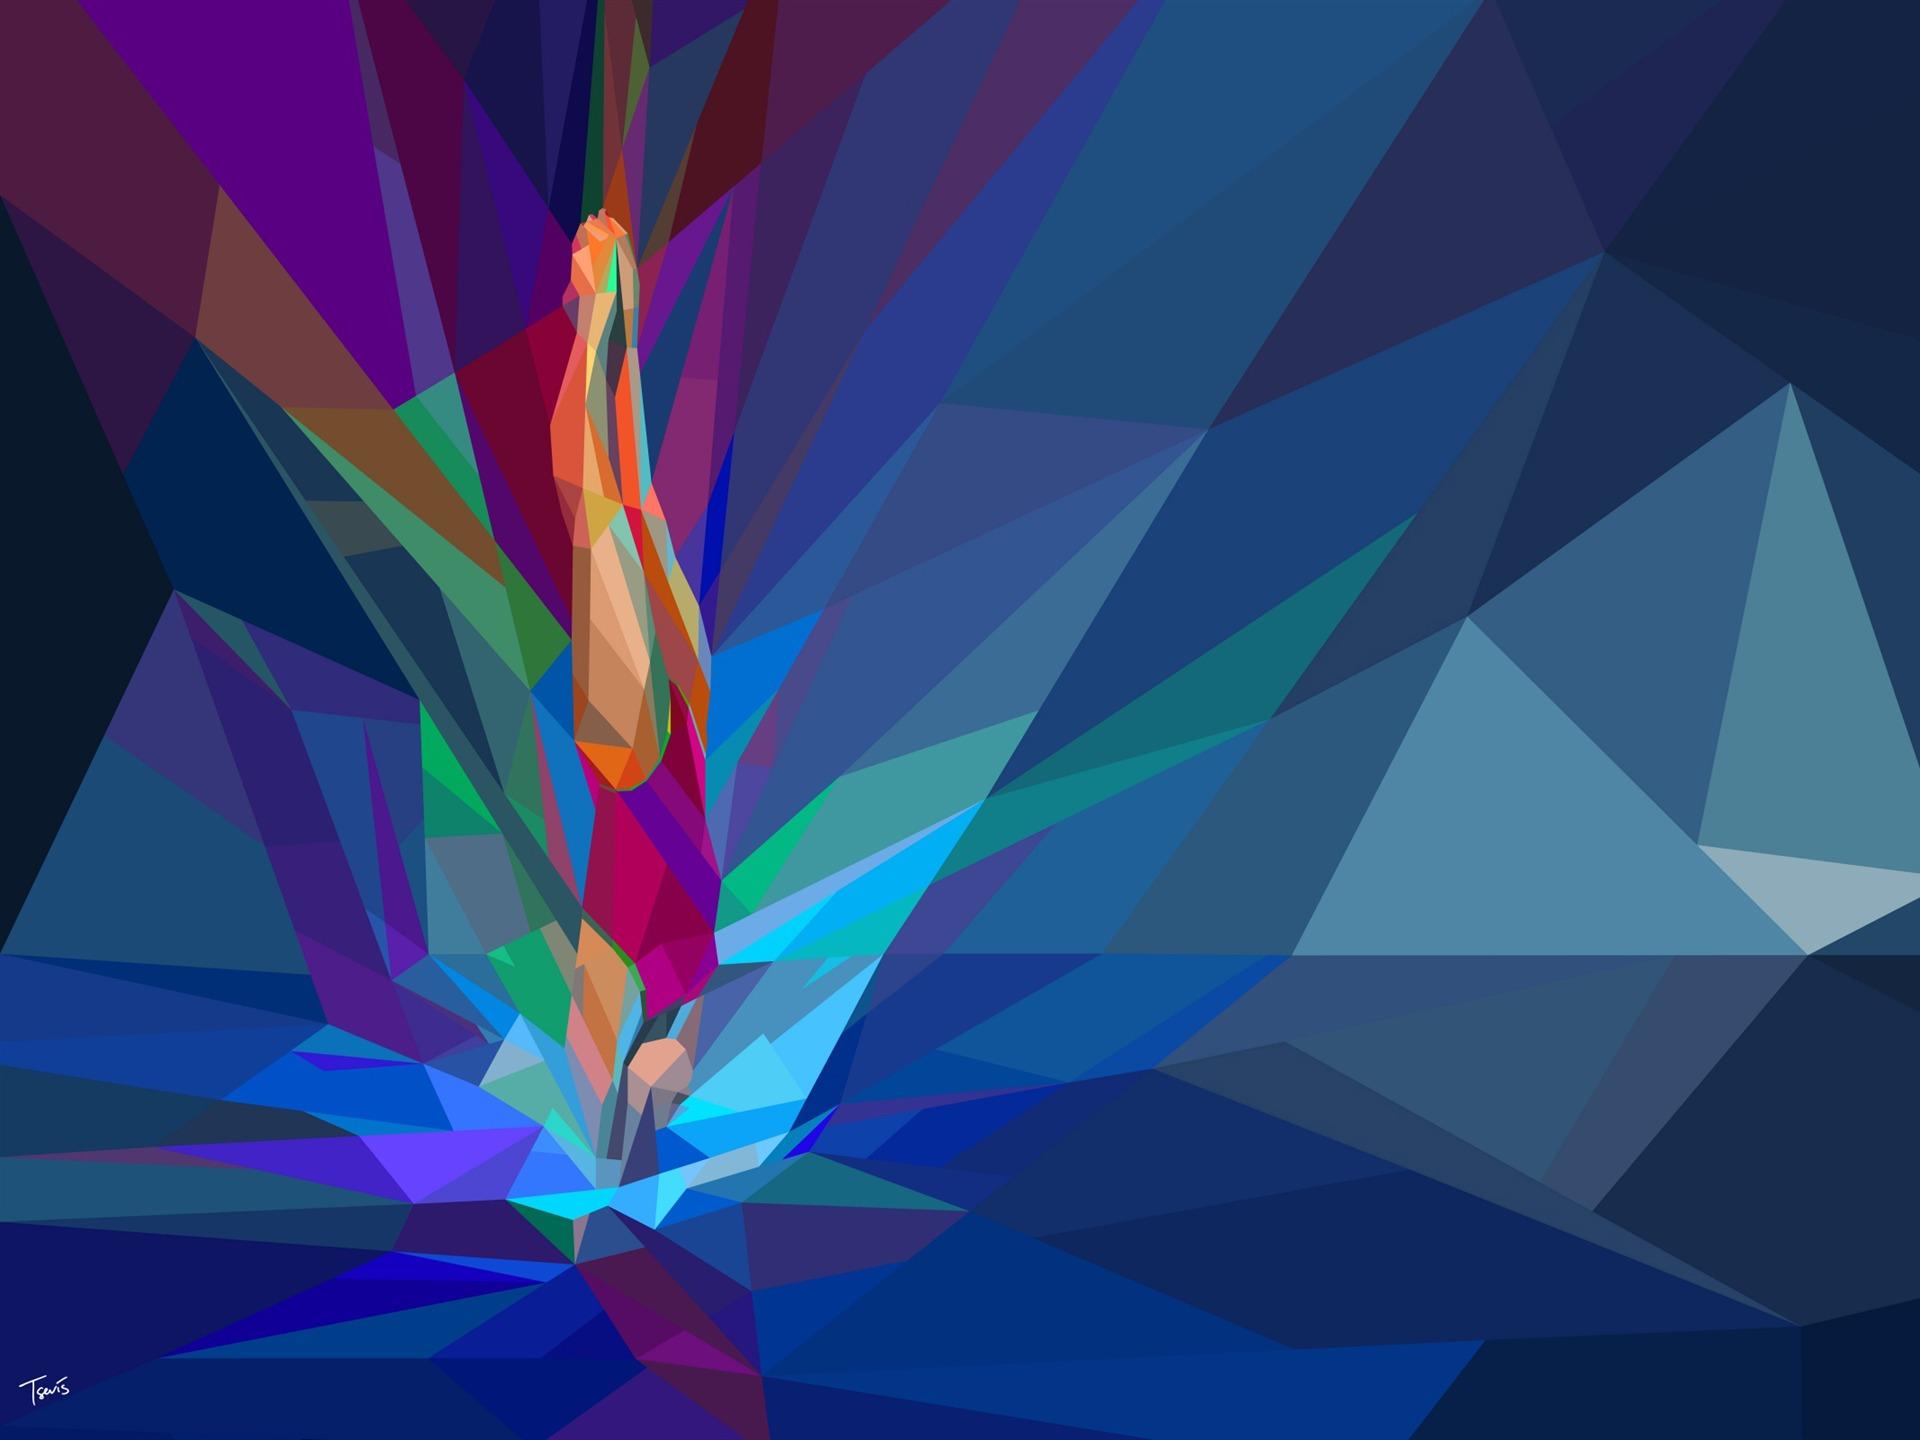 Rio 2016 Olympic Games Hd Vector Wallpaper 01 Avance